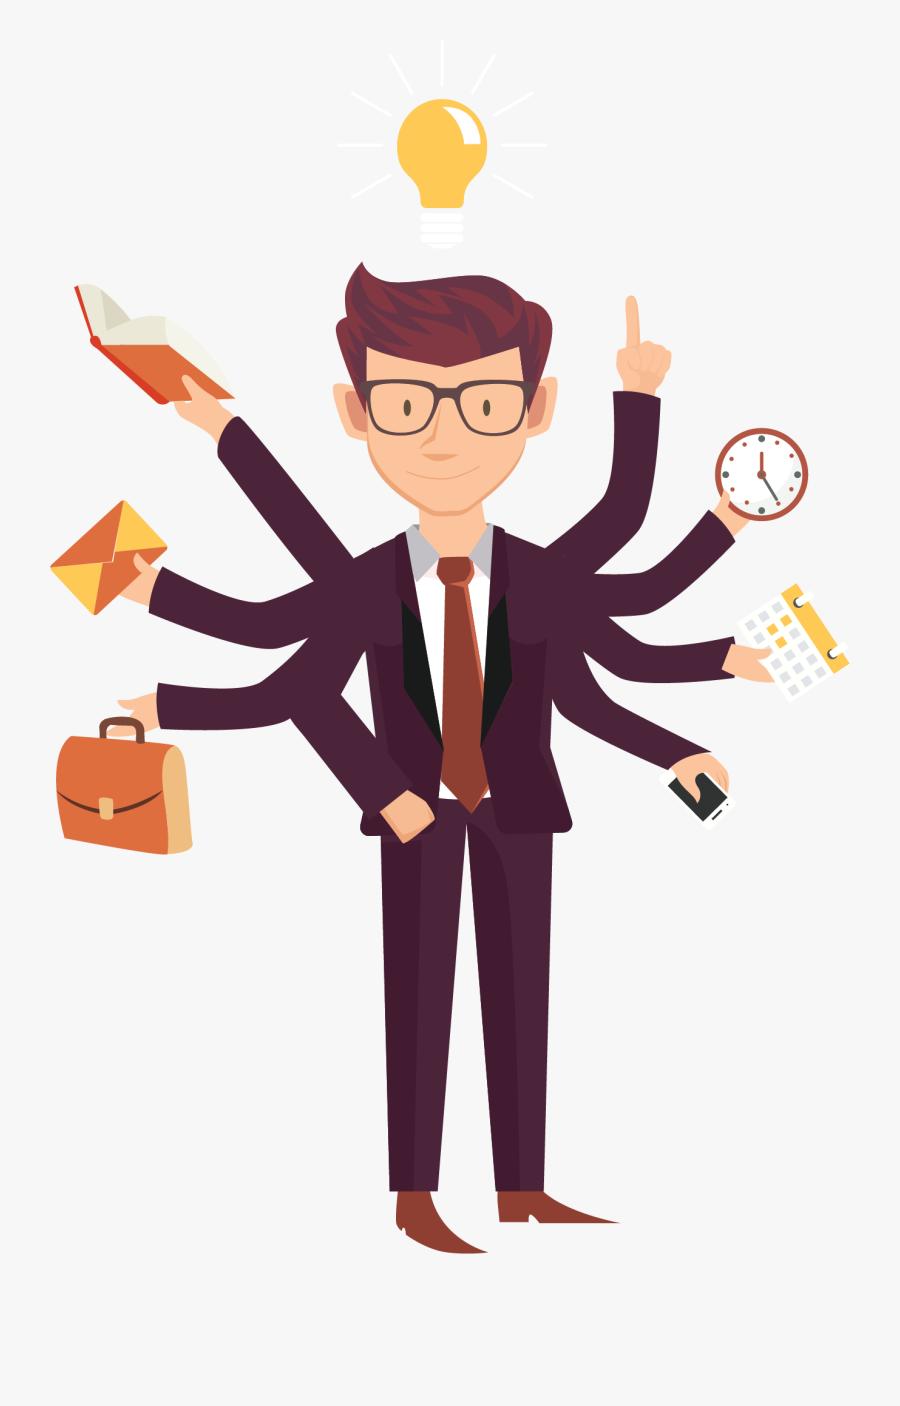 Busy Business People Entrepreneurship Job Employment - Business Is Better Than Job, Transparent Clipart